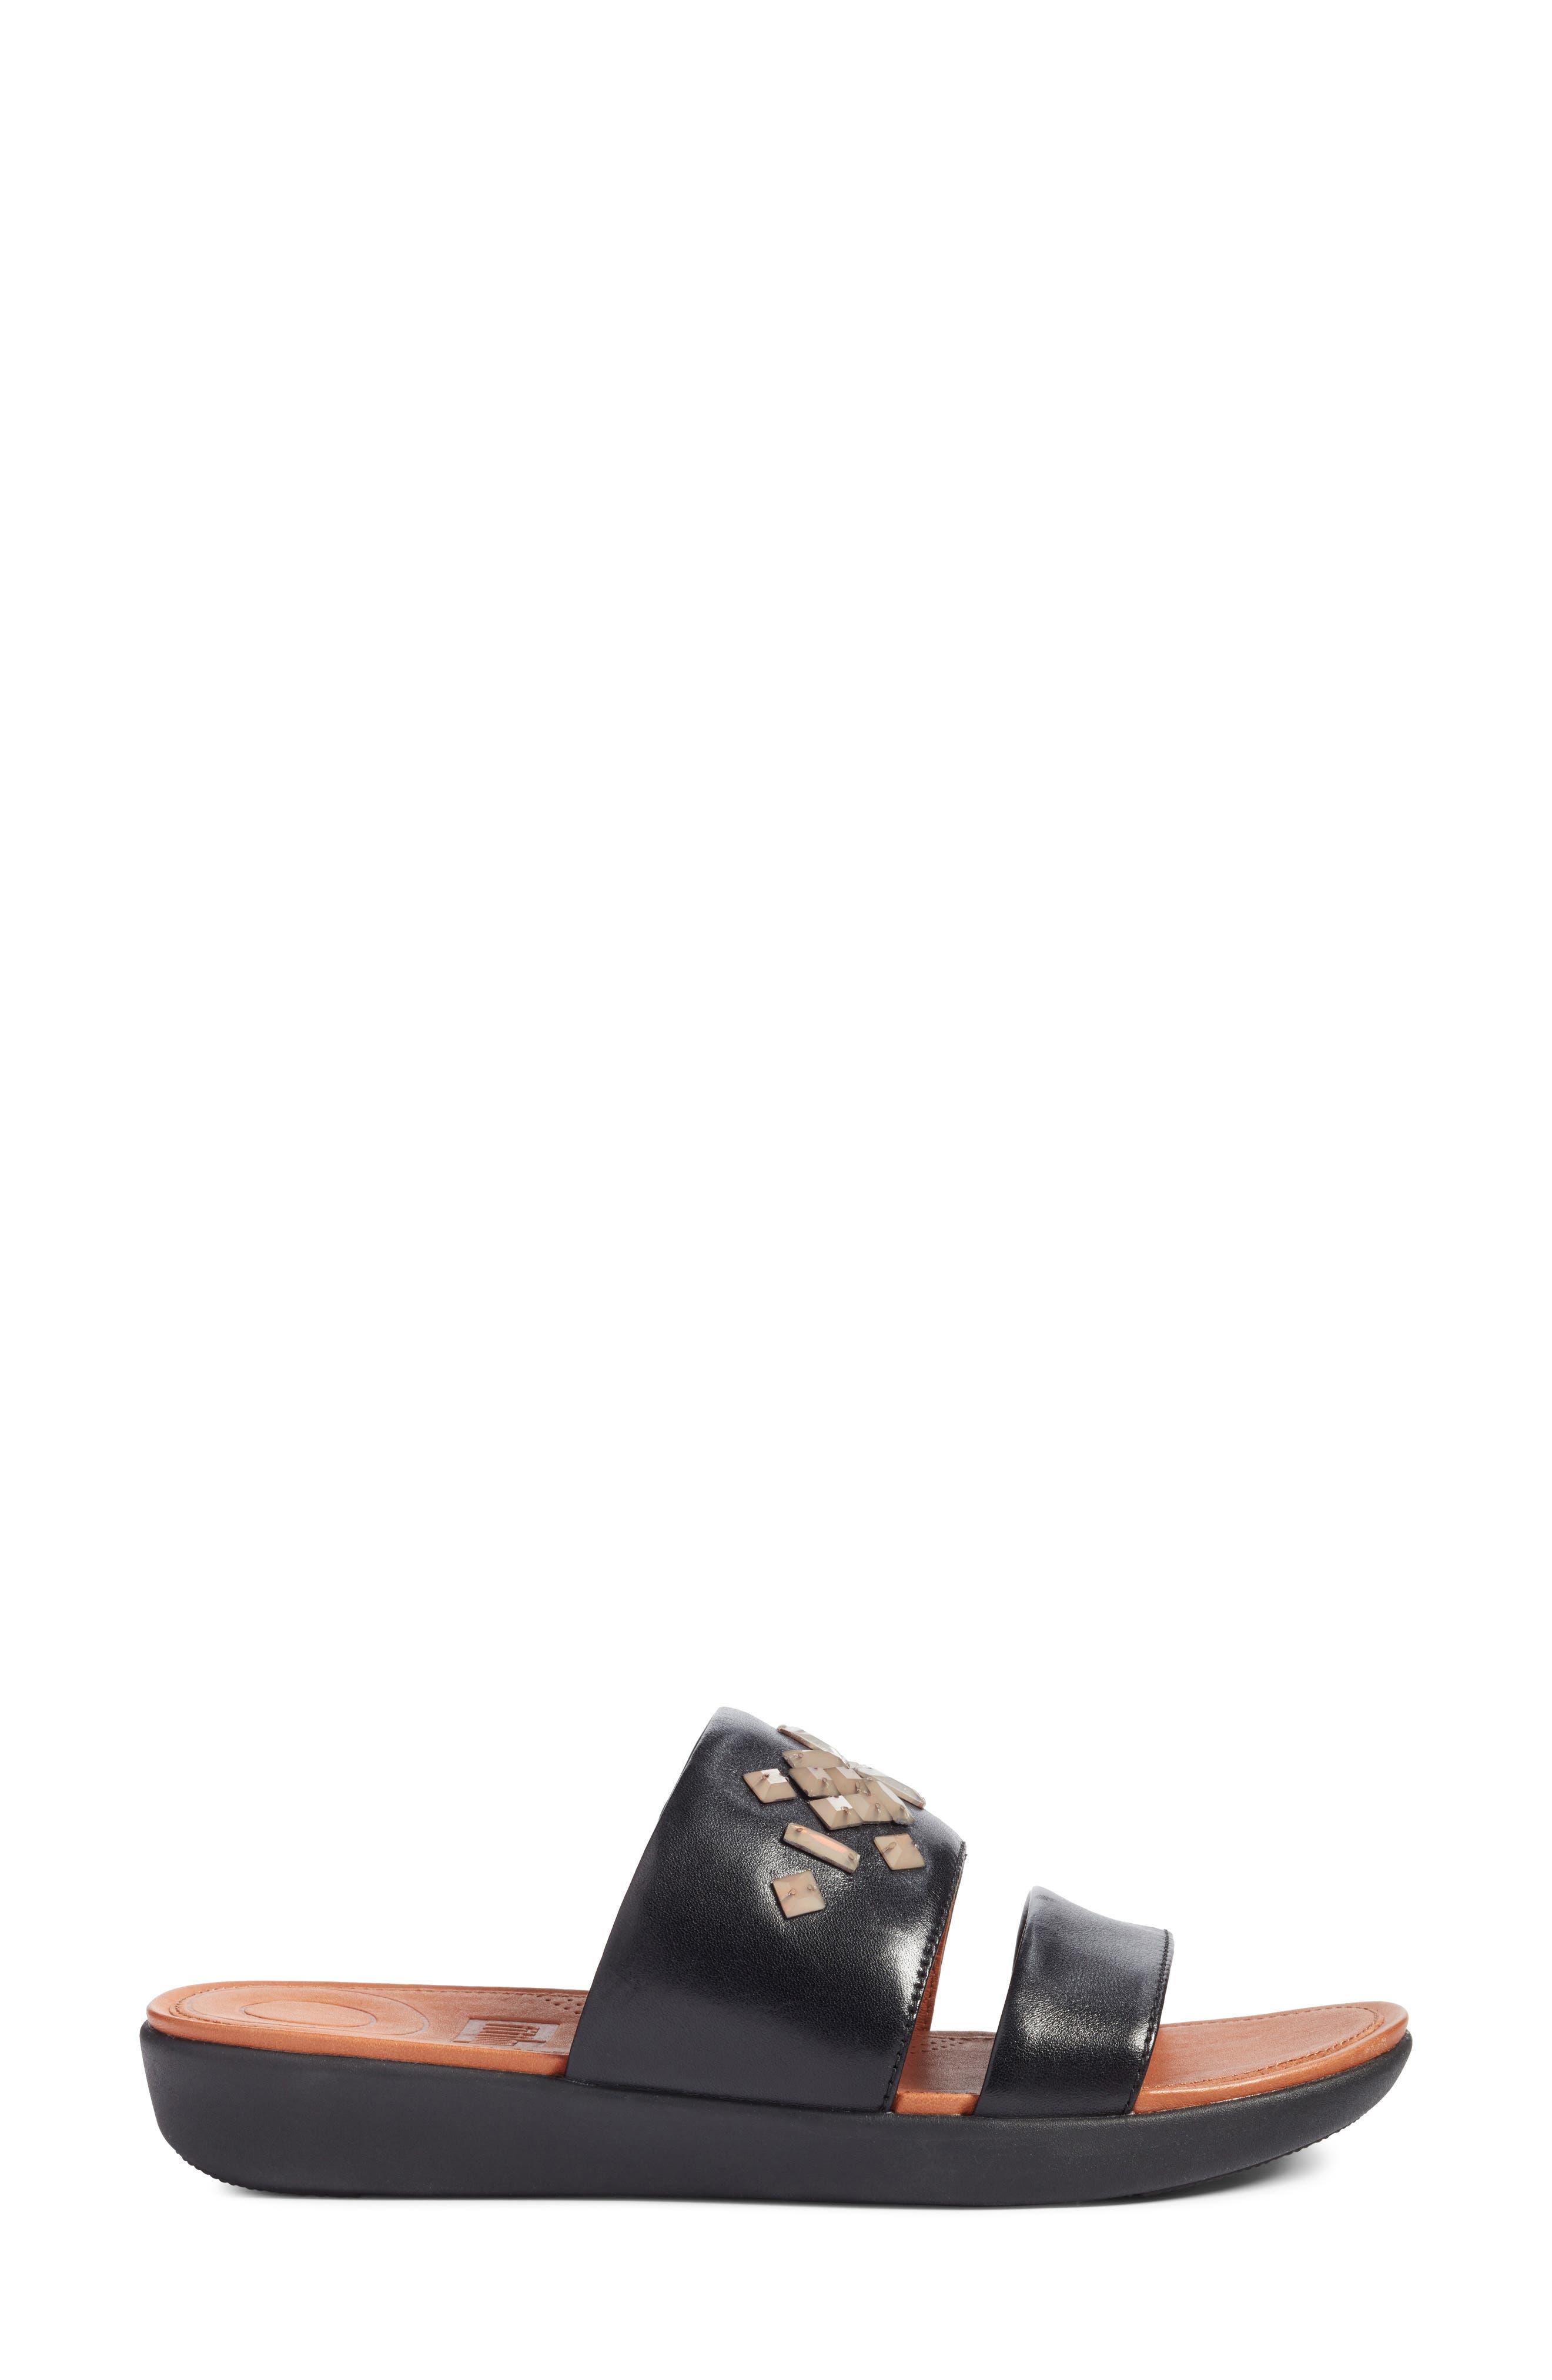 Delta Slide Sandal,                             Alternate thumbnail 3, color,                             BLACK LEATHER